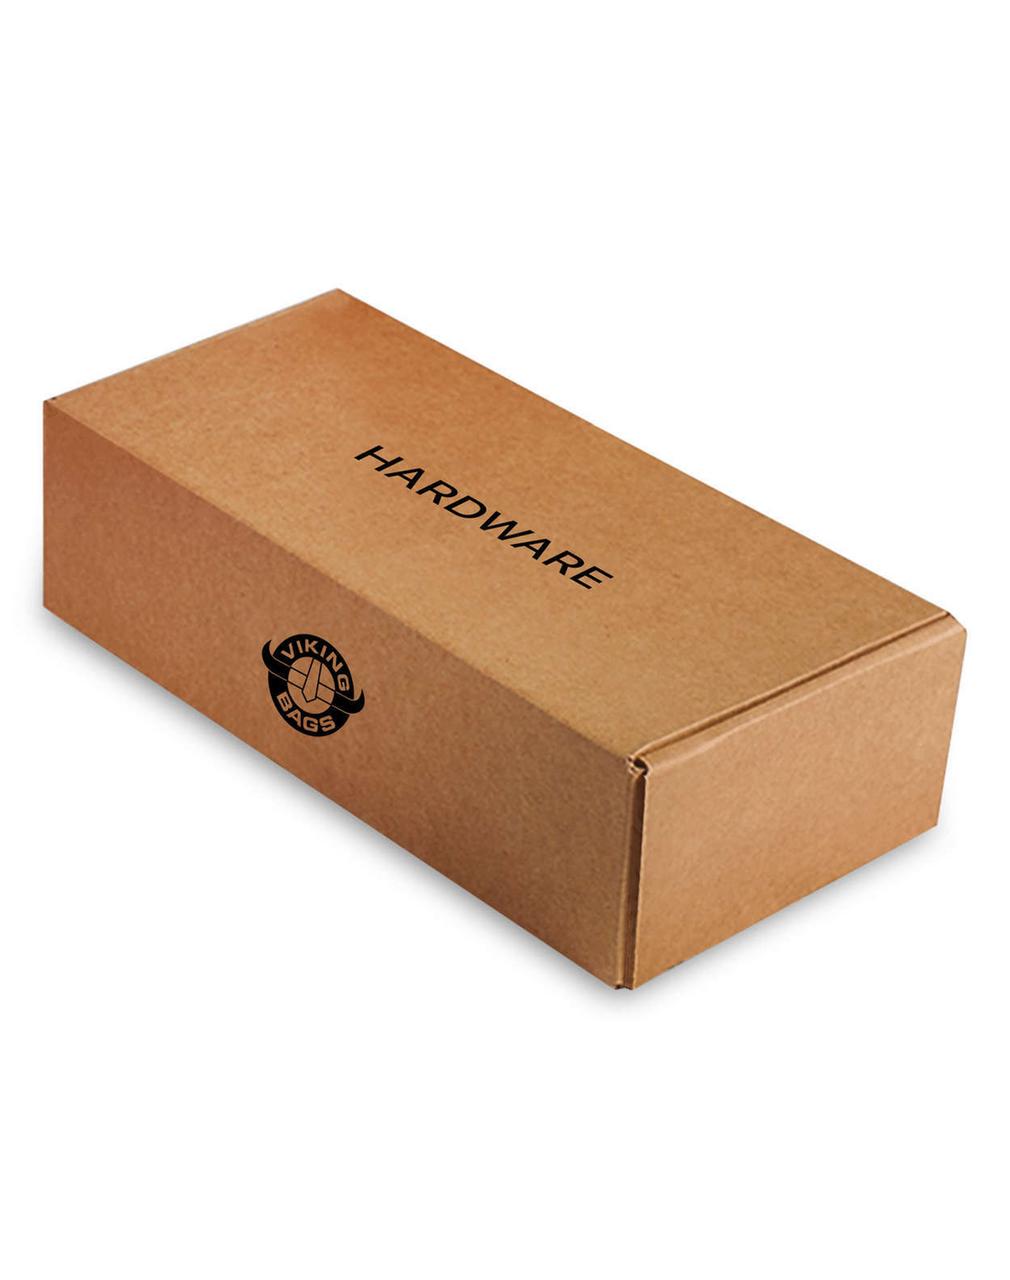 Honda 750 Shadow Phantom Braided Motorcycle Saddlebags box